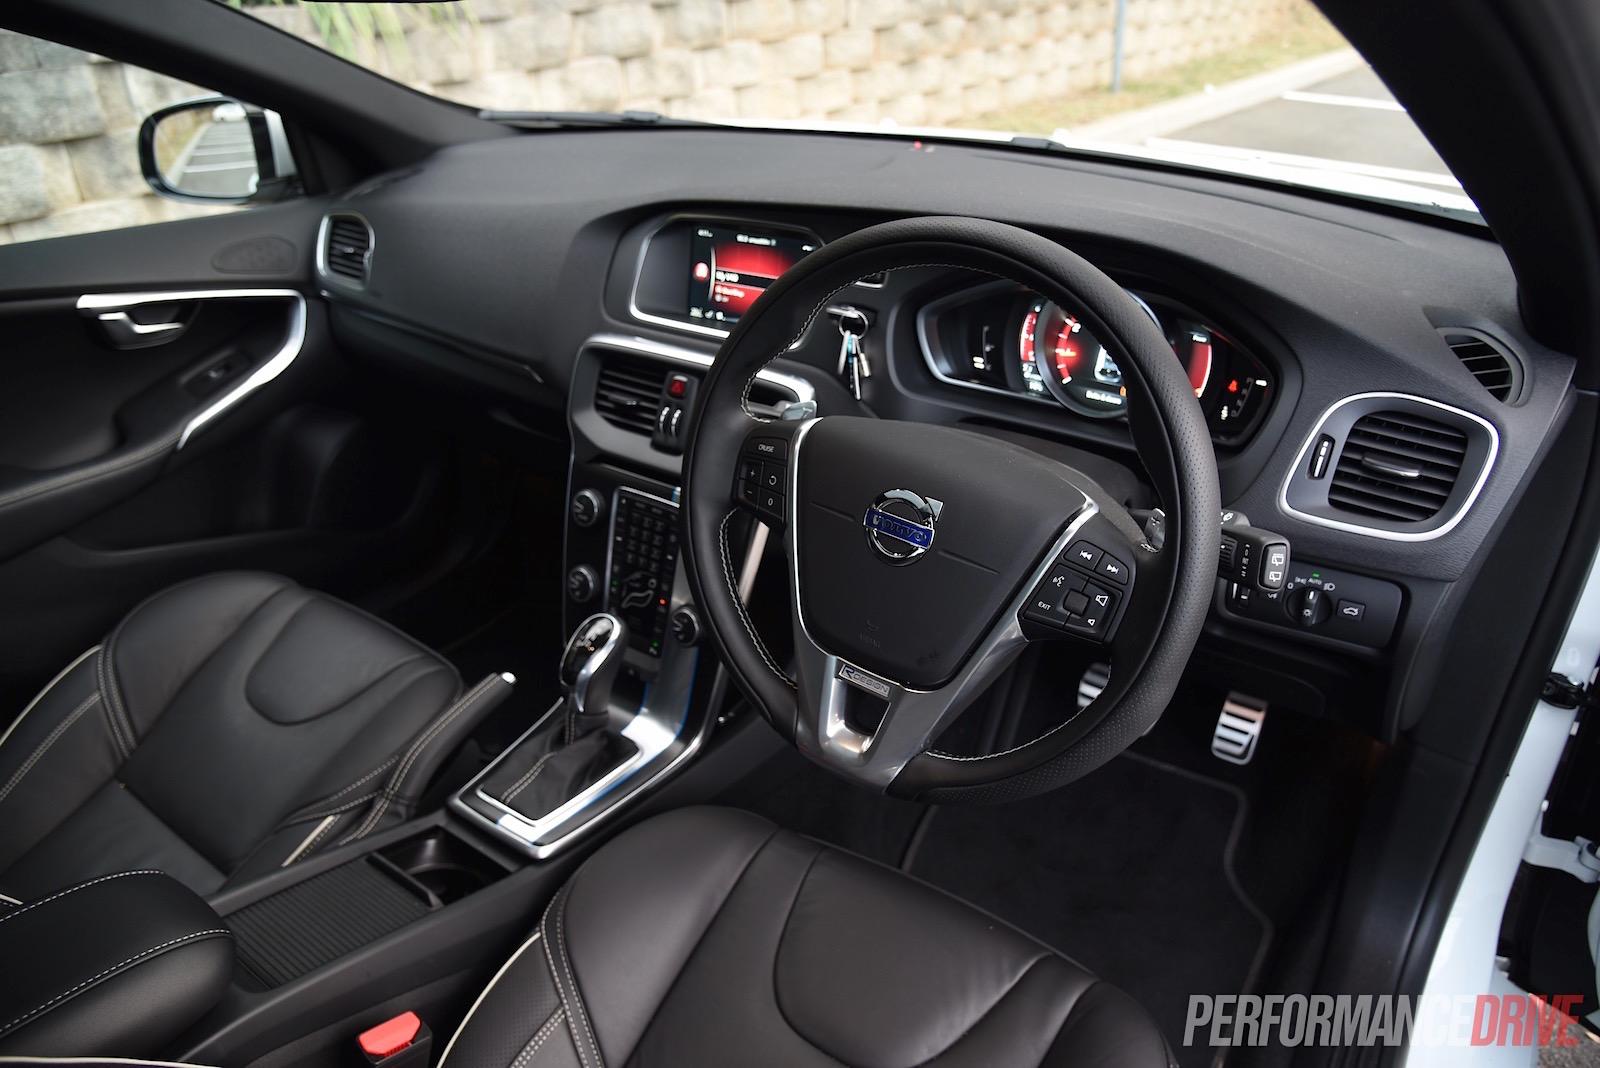 http://performancedrive.com.au/wp-content/uploads/2015/07/2015-Volvo-V40-T5-R-Design-interior.jpg